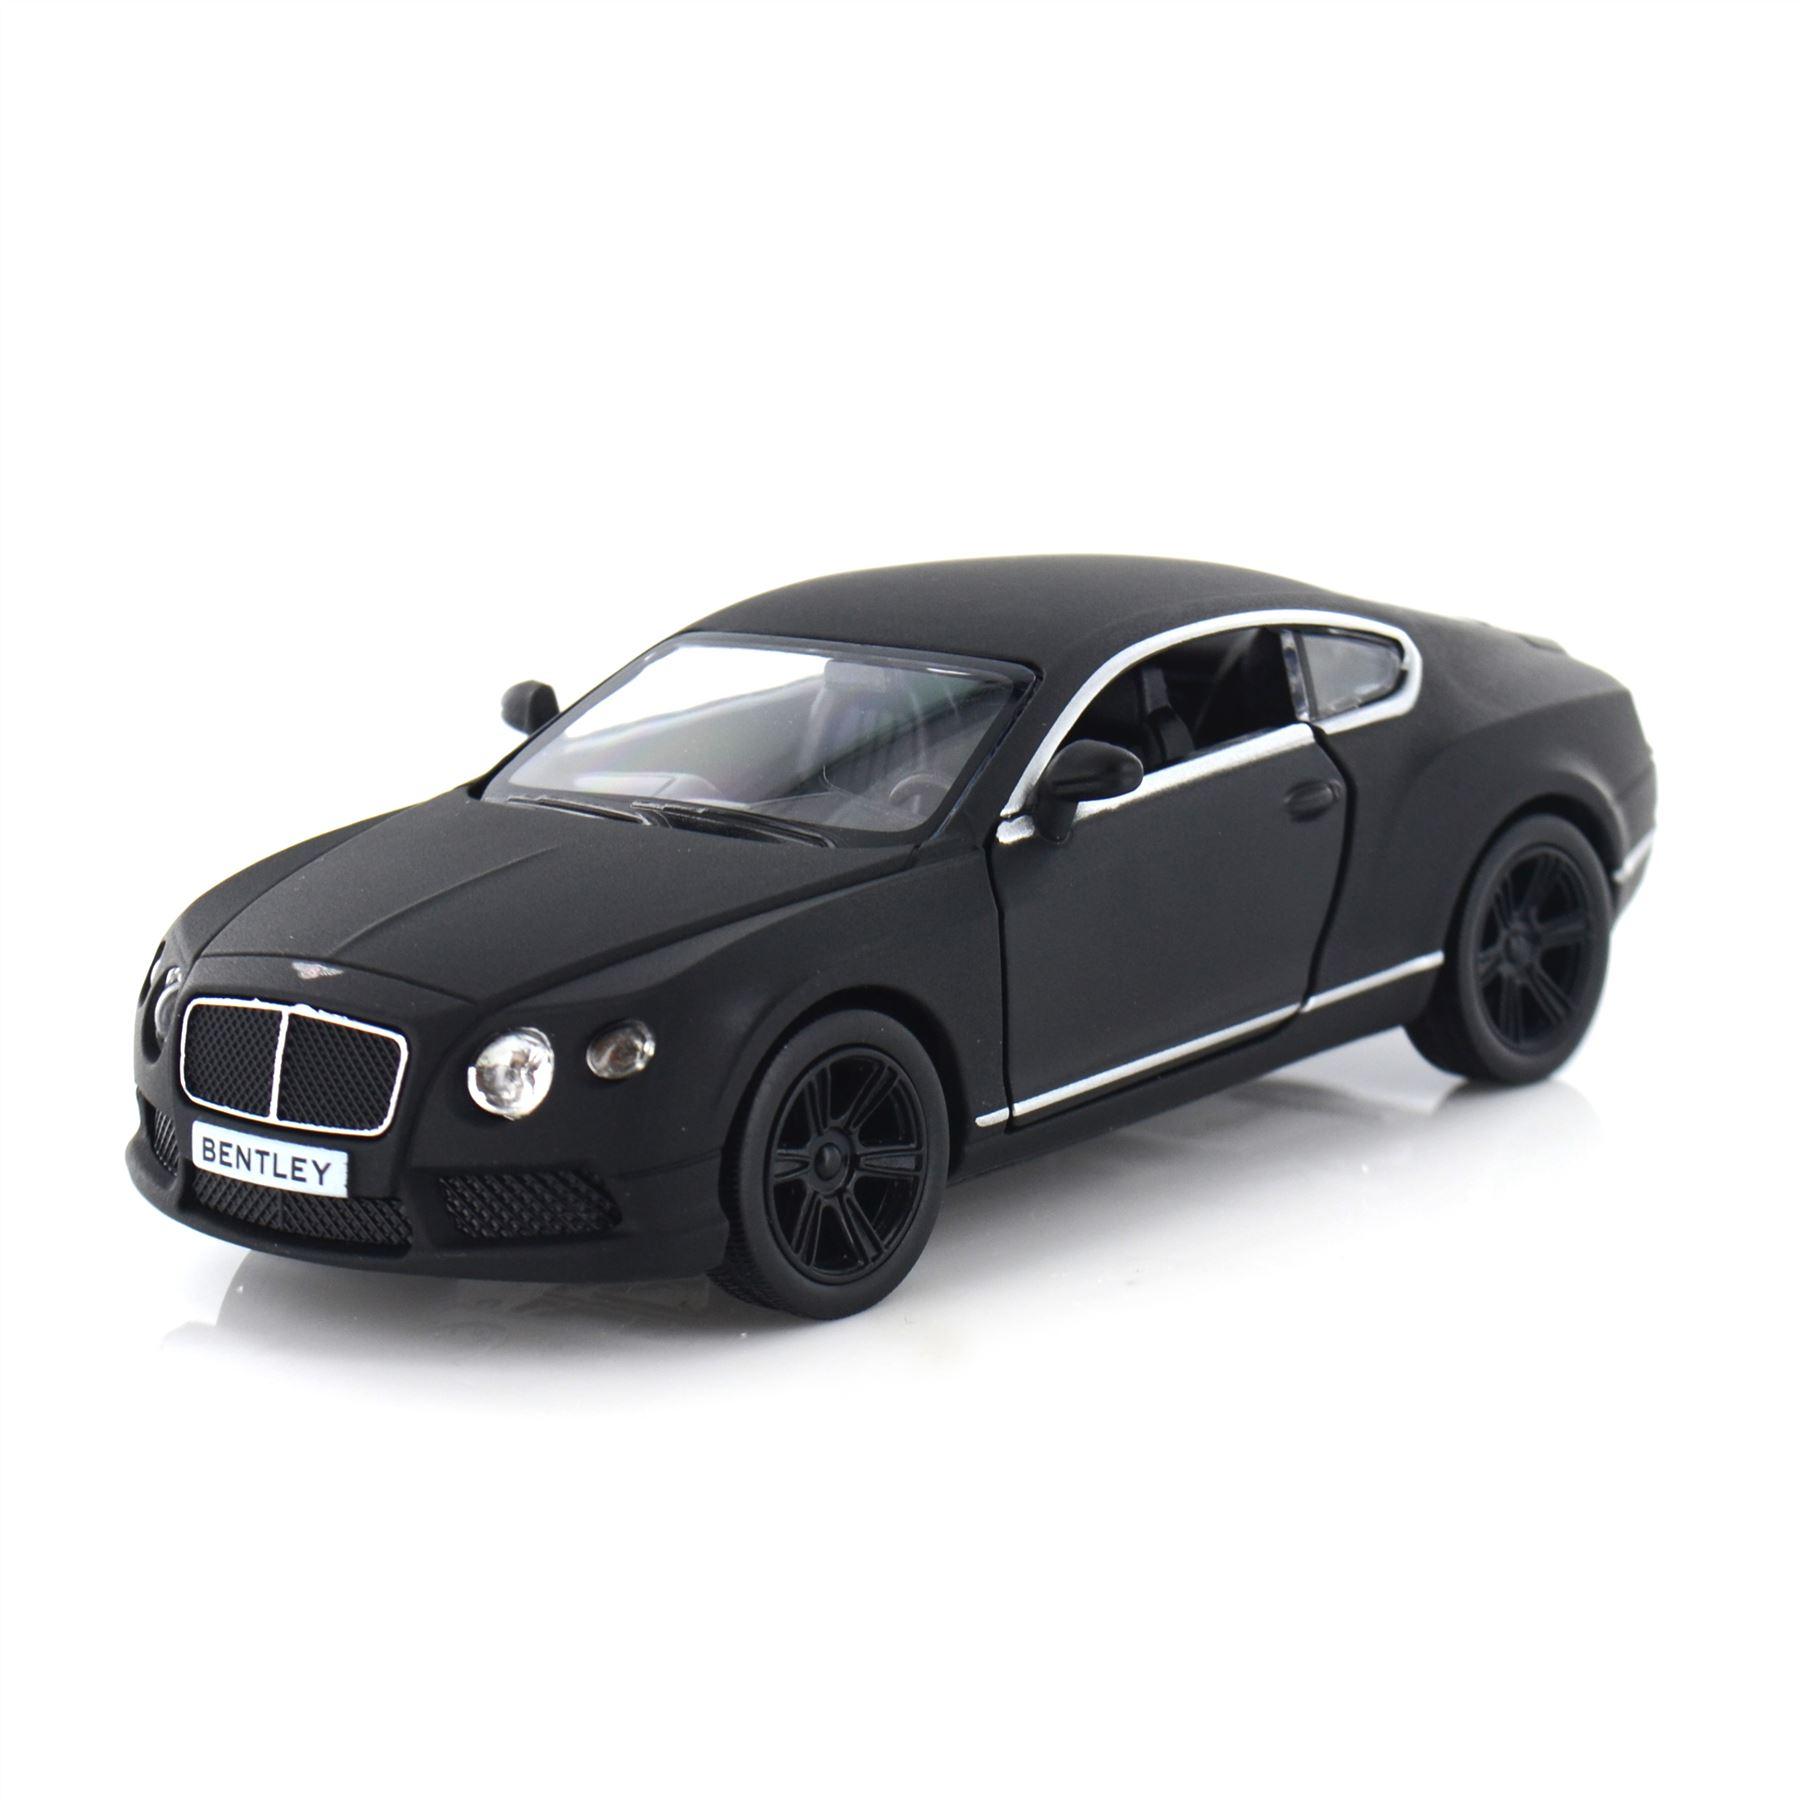 New Matt Black 1:32 Scale Model Sports Cars Dicast Toy